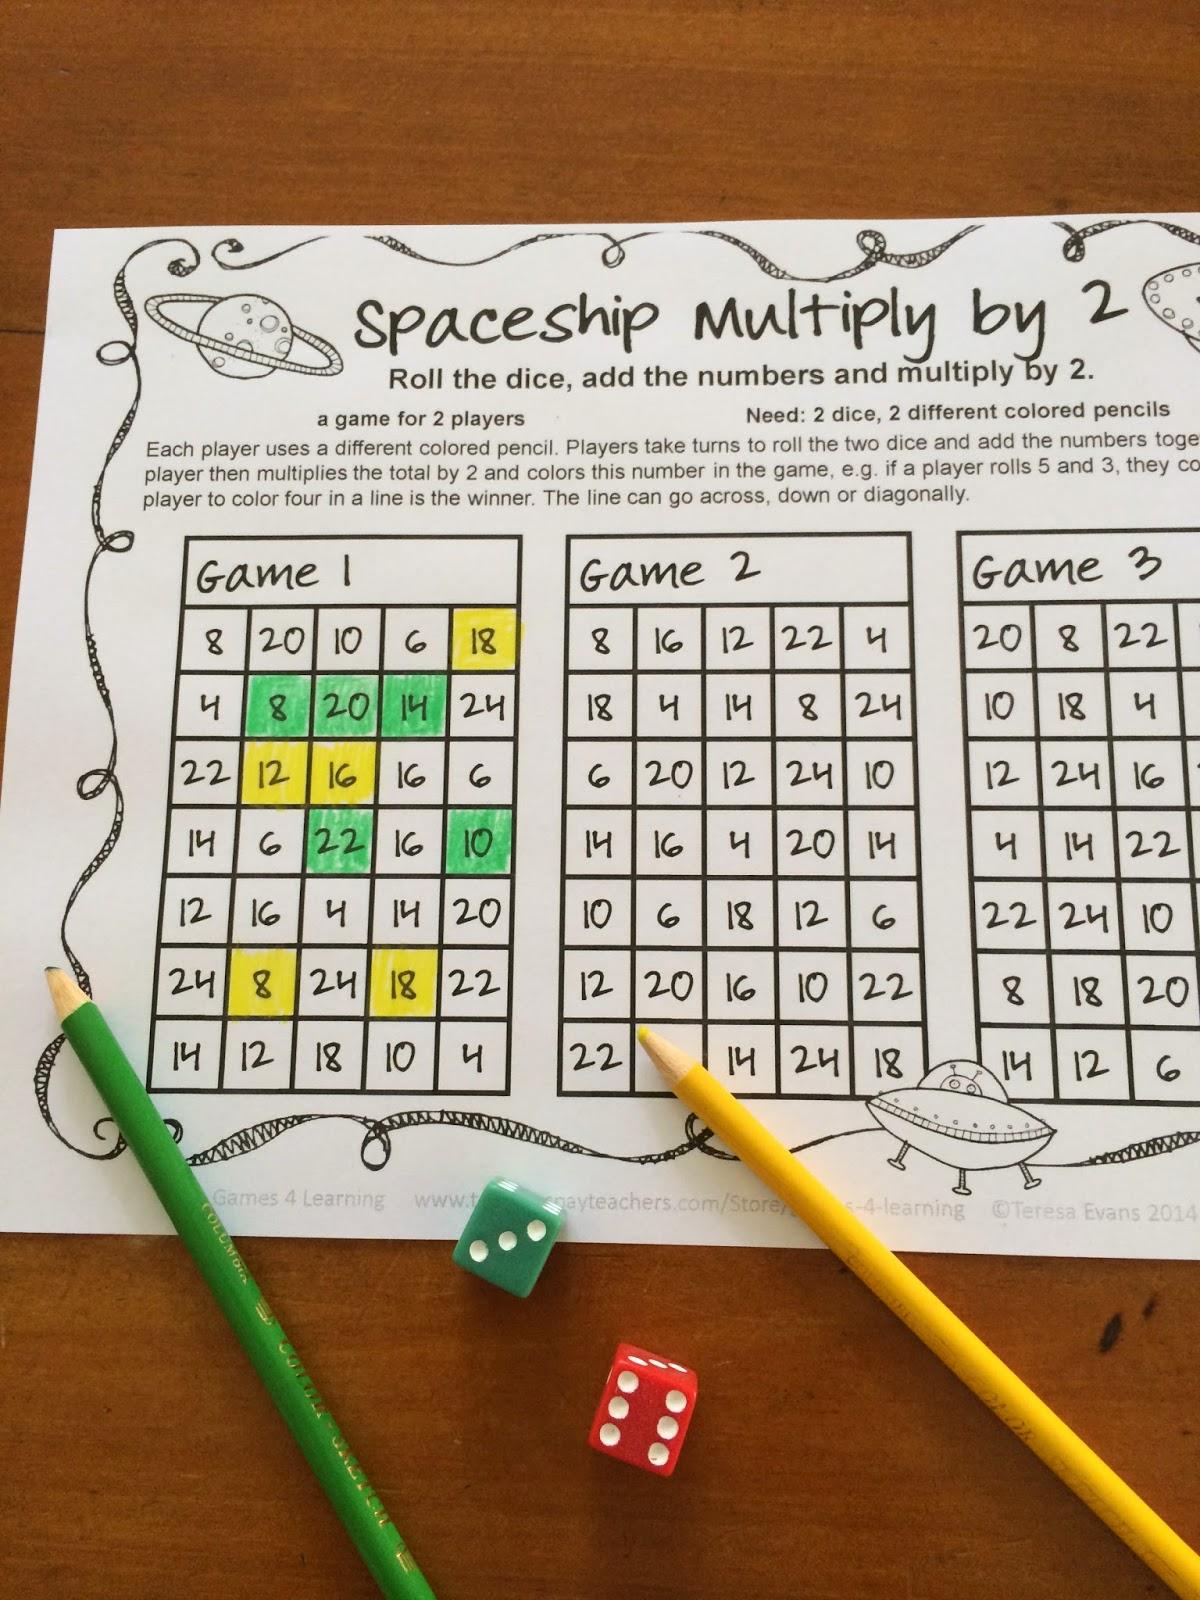 http://www.teacherspayteachers.com/Product/Multiplication-Games-NO-PREP-Longest-Line-1197085